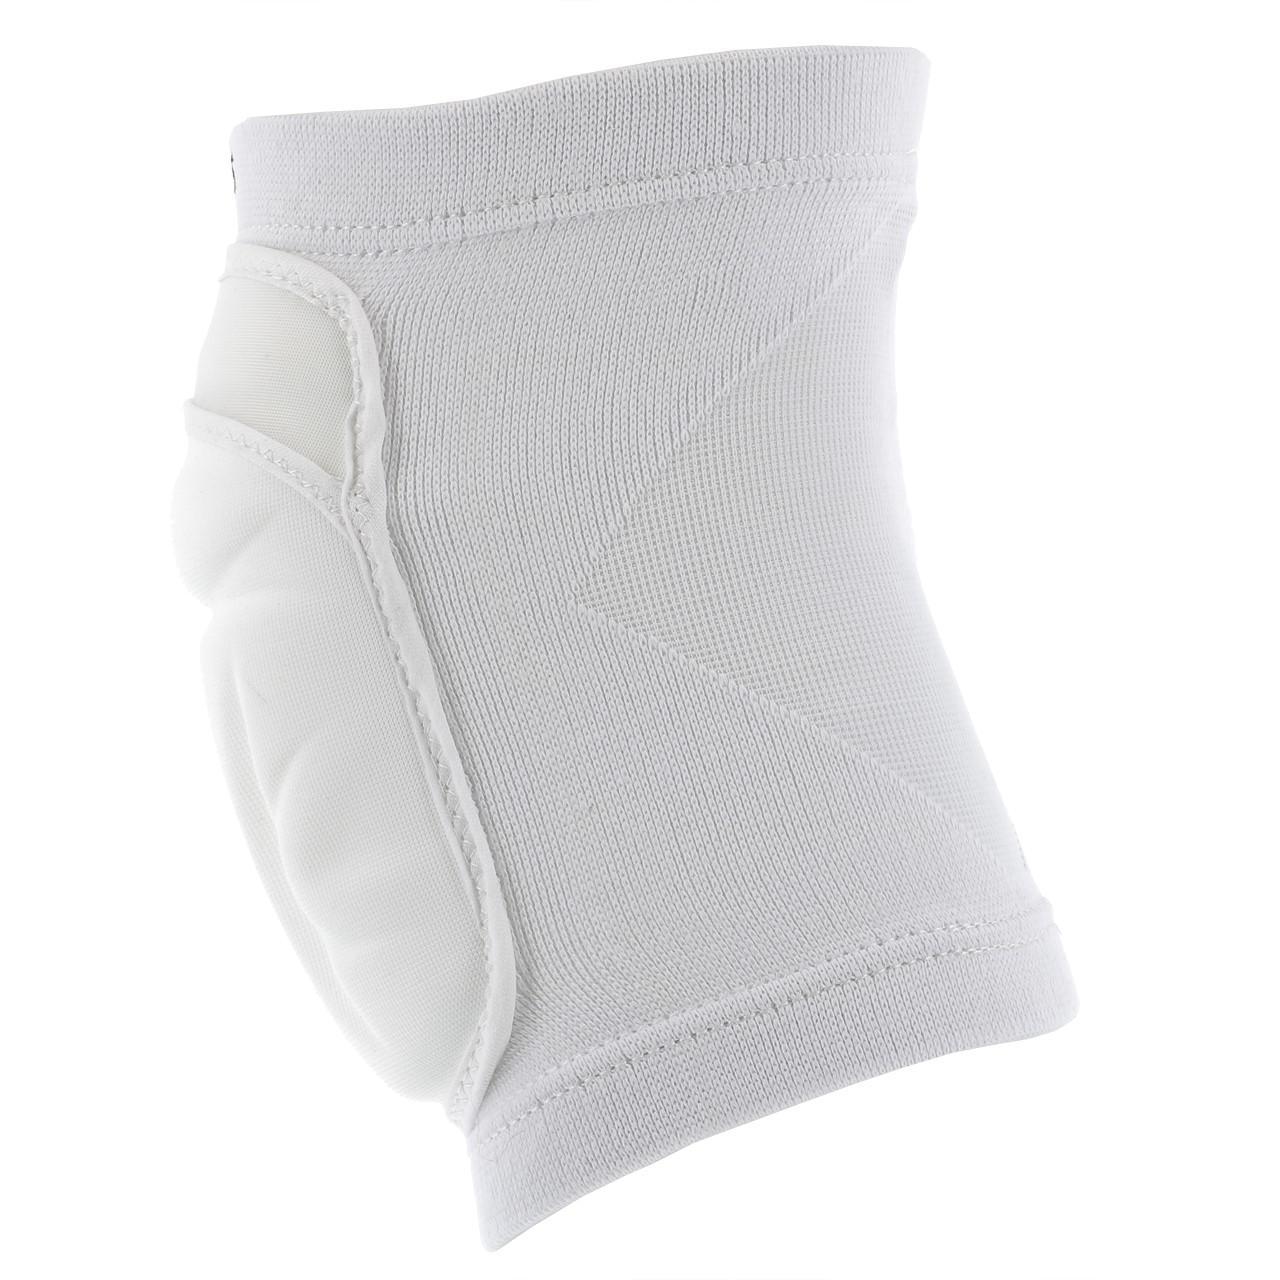 Knee-Pad-Set-Protection-Asics-Performance-White-Kneepad-White-15977-New thumbnail 3